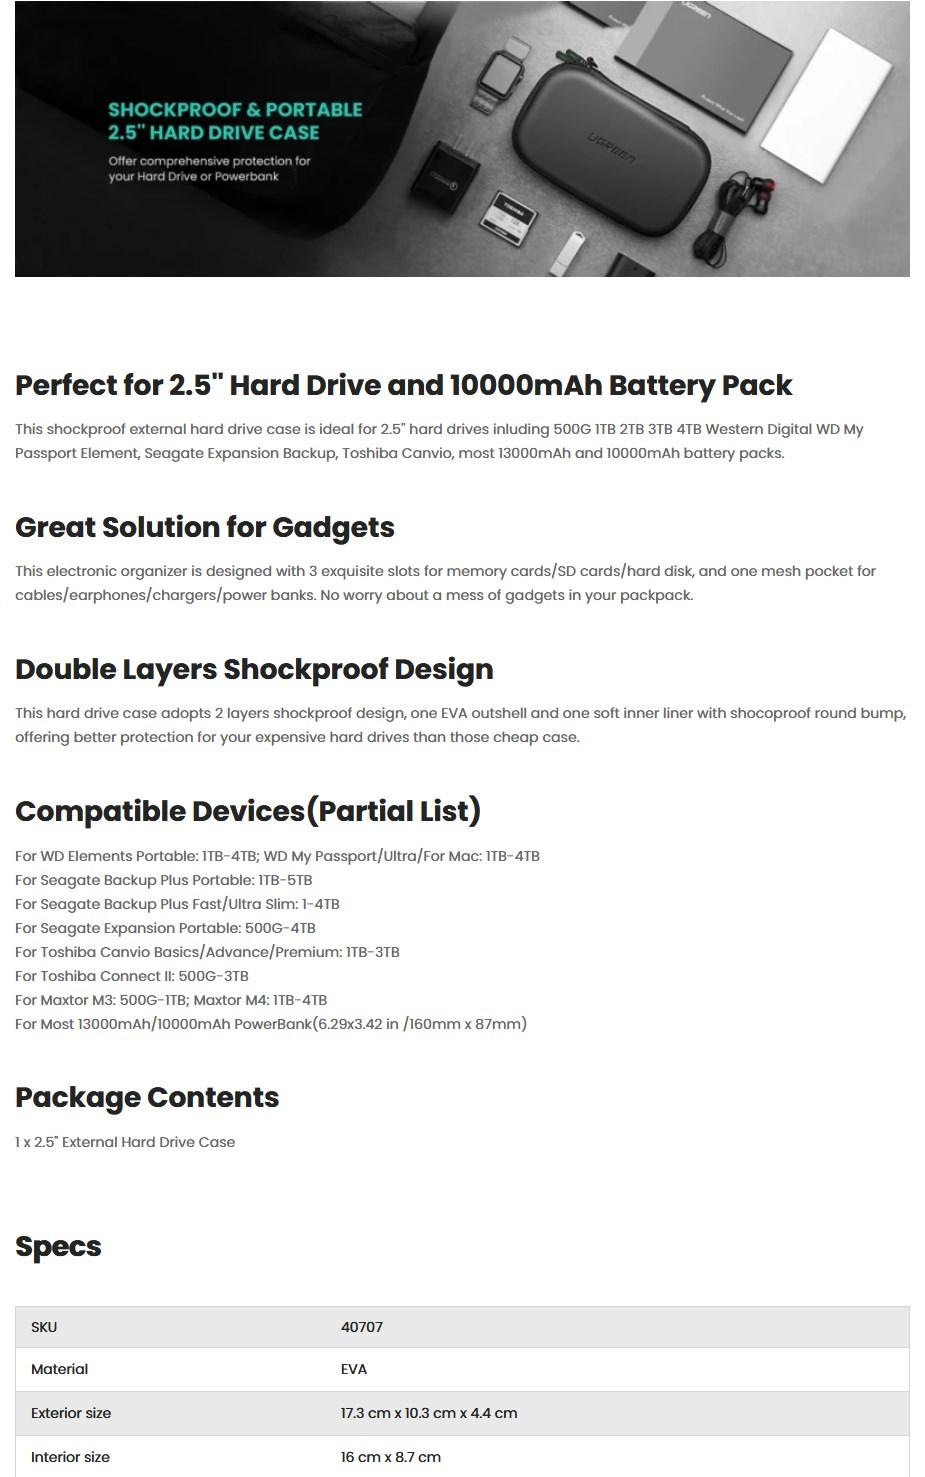 Ugreen 40707 Hard Disk Small Storage Bag - Black - Overview 1